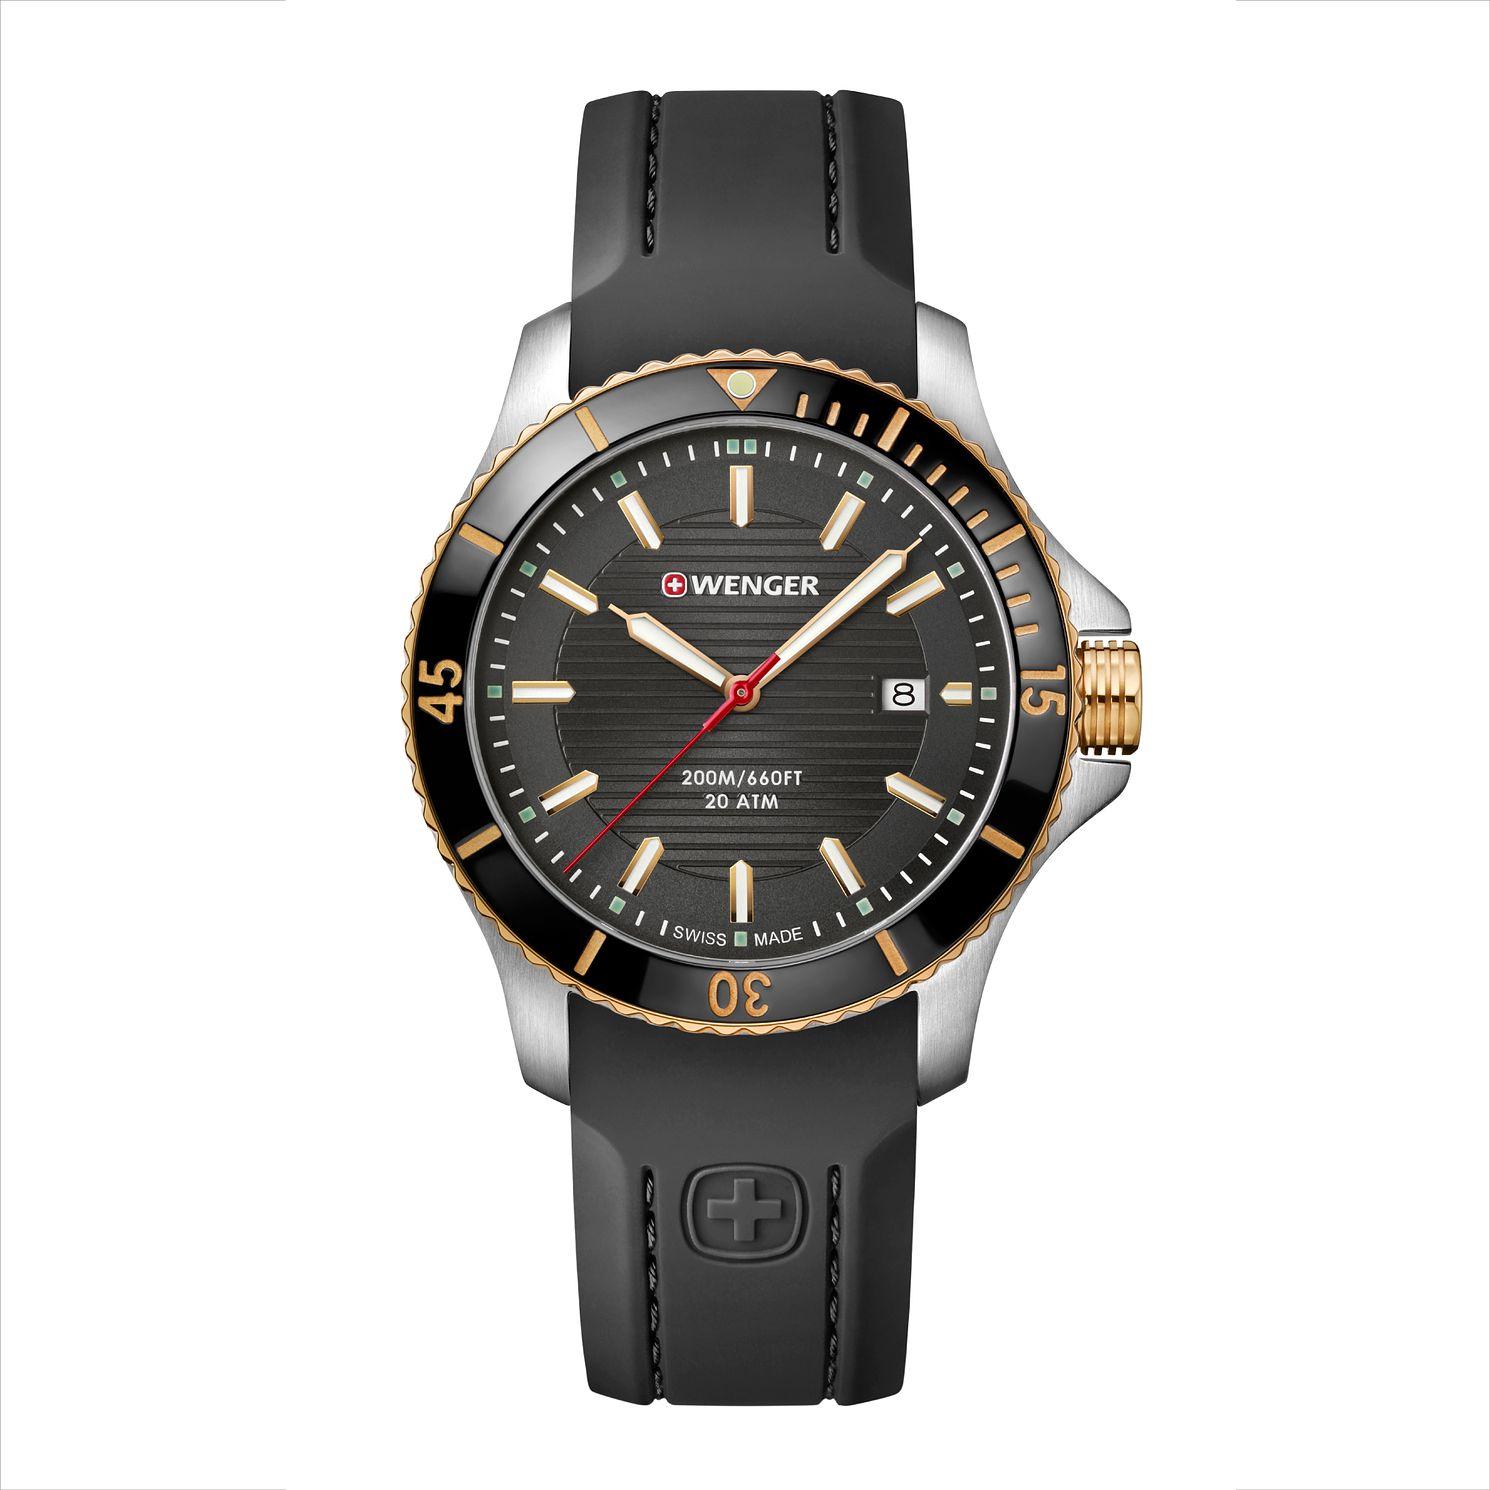 Wenger Seaforce Men's Quartz Black Silicone Strap Watch £84 at H Samuel